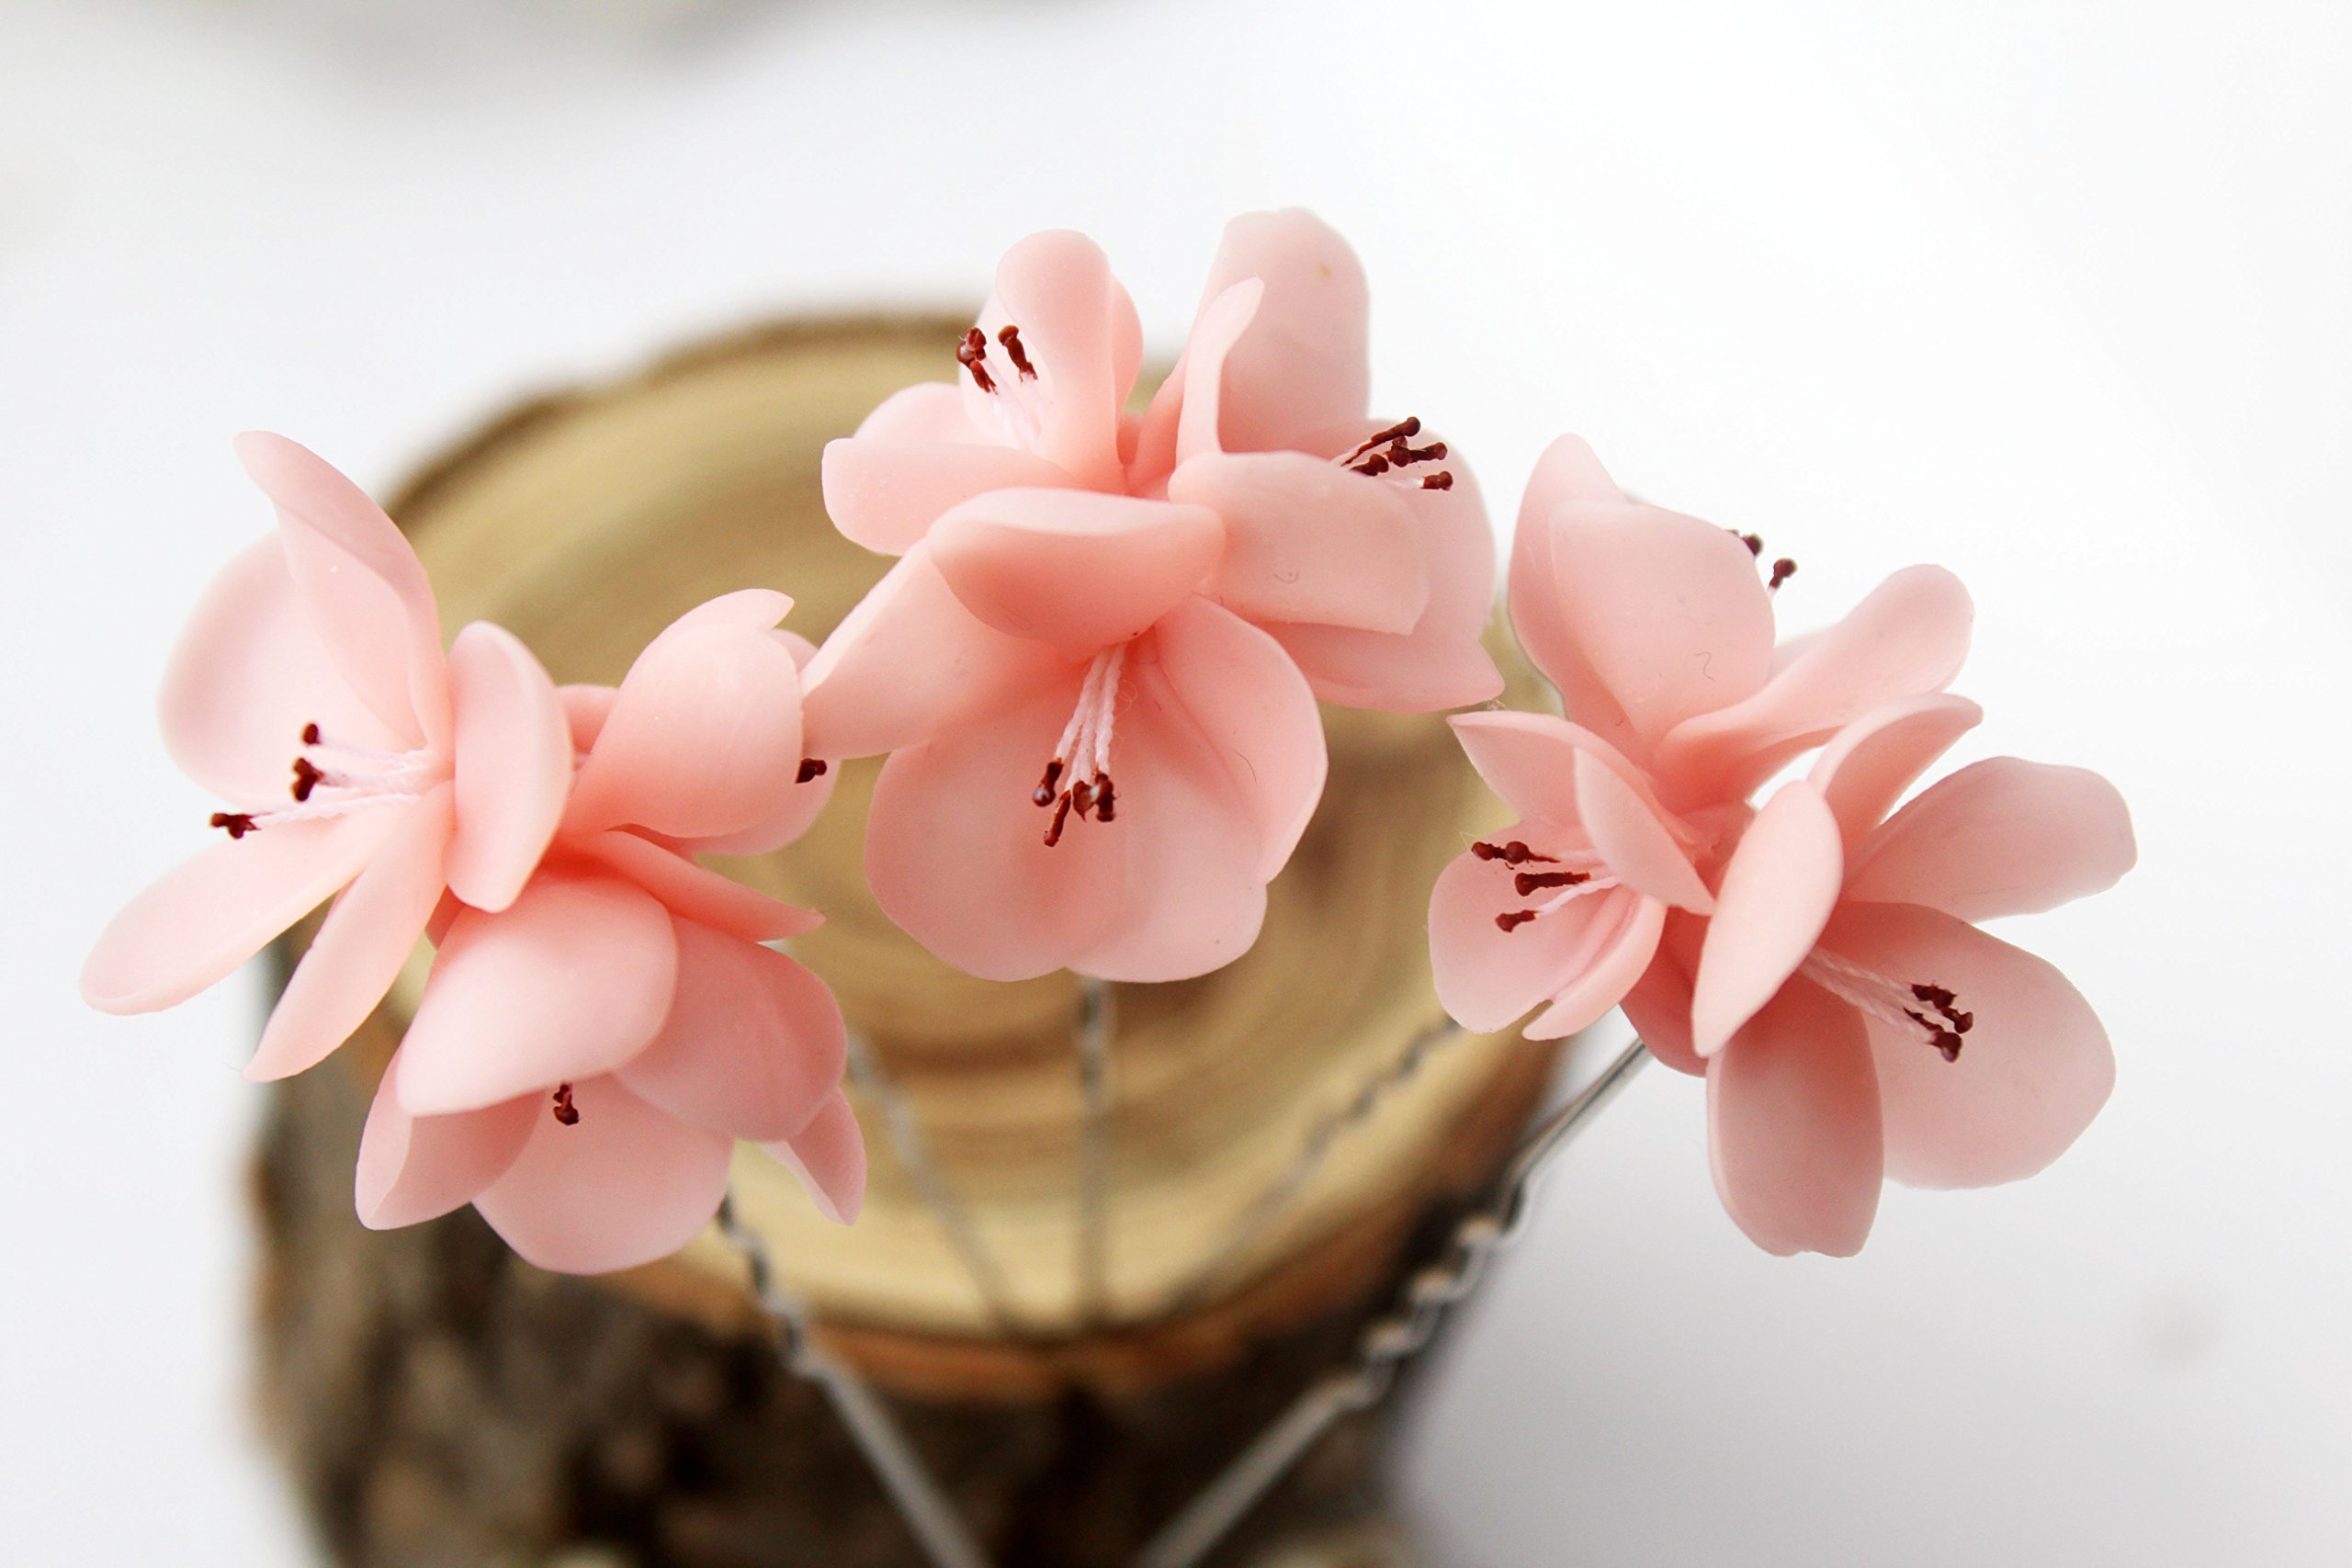 Cherry blossom bridal hair pin, Set of 3, Bridal pink Hair Pins, Flower hair pin, Rustic wedding, Bridal Hair Pins, sakura, cherry wedding